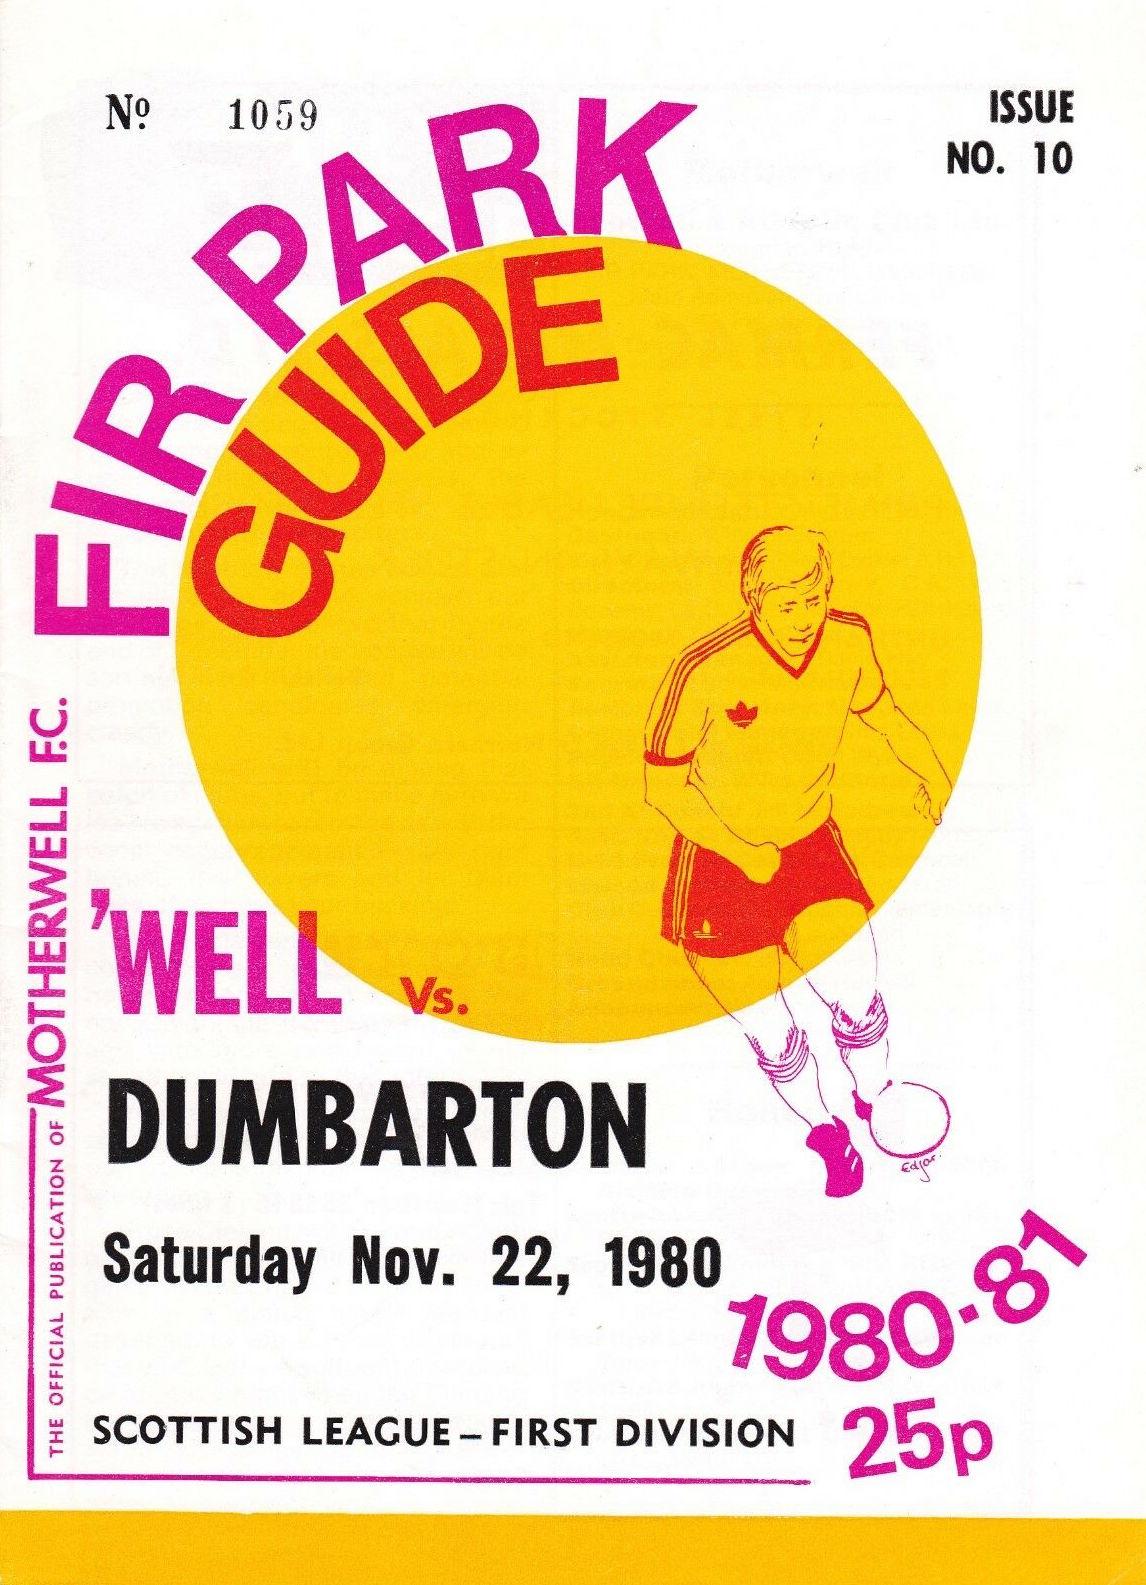 versus Dumbarton Programme Cover